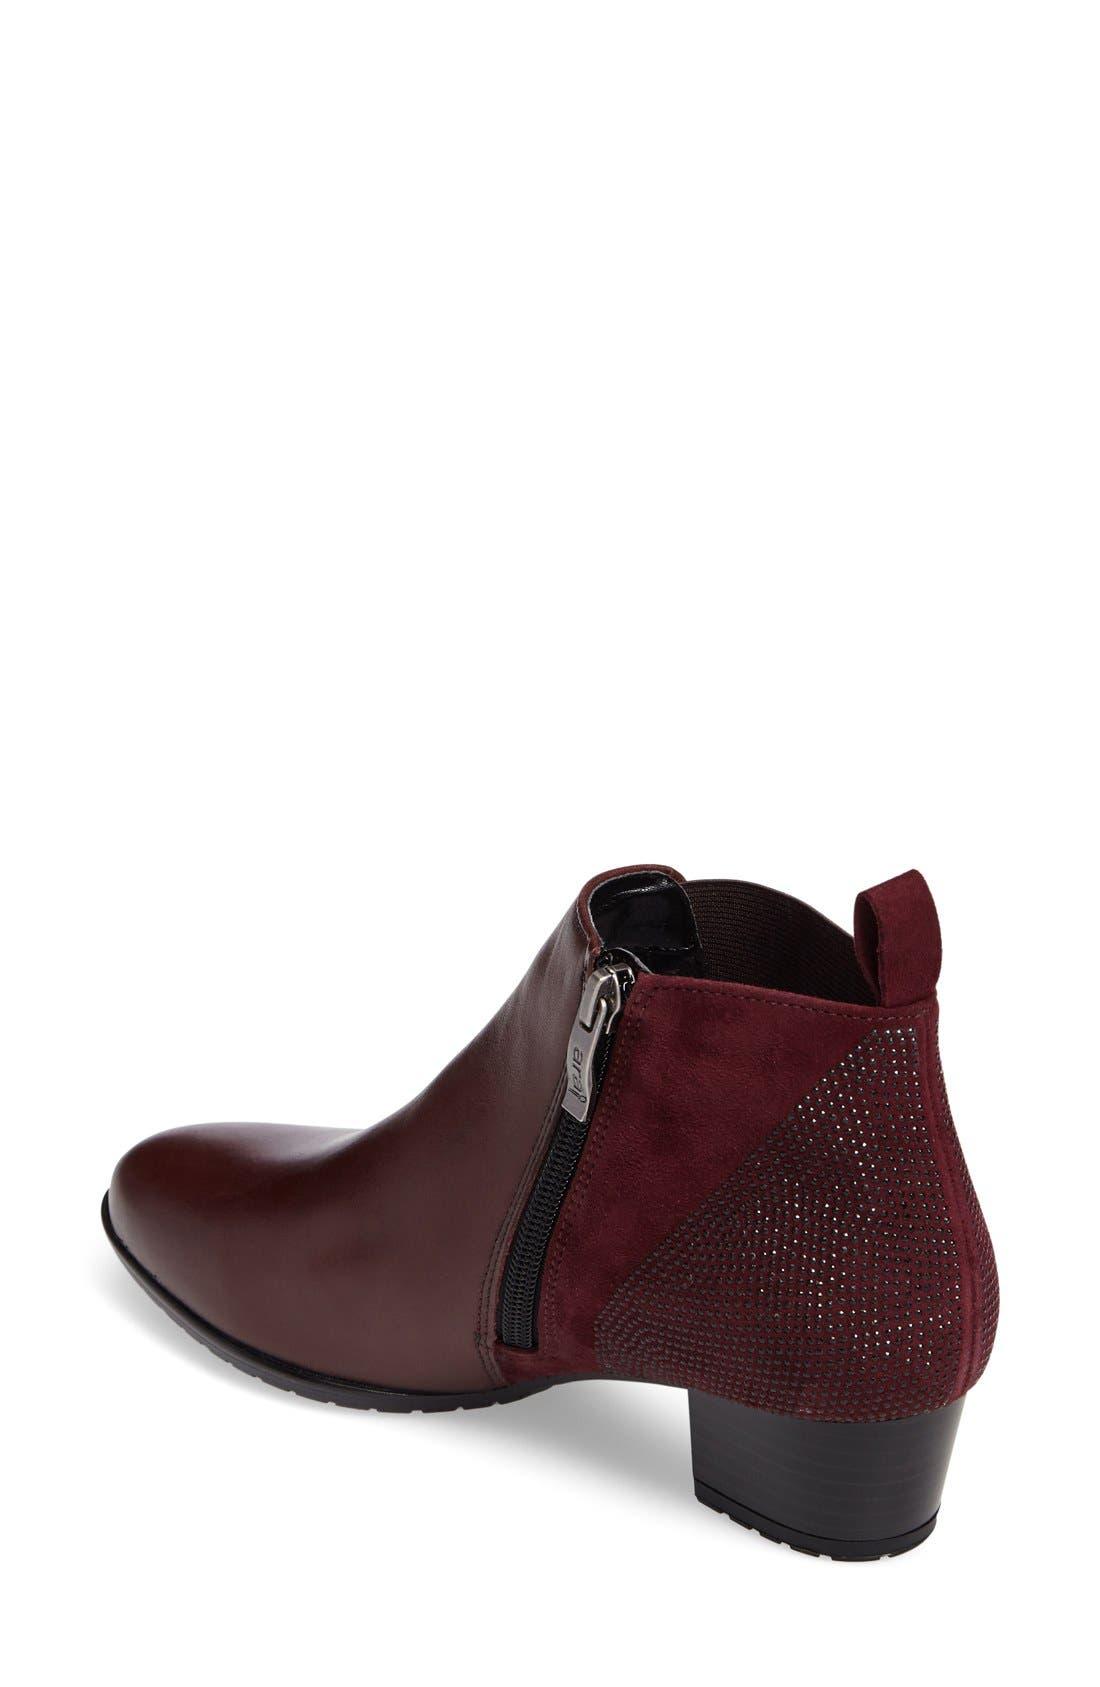 'Patty' Block Heel Boot,                             Alternate thumbnail 2, color,                             Burgundy Leather